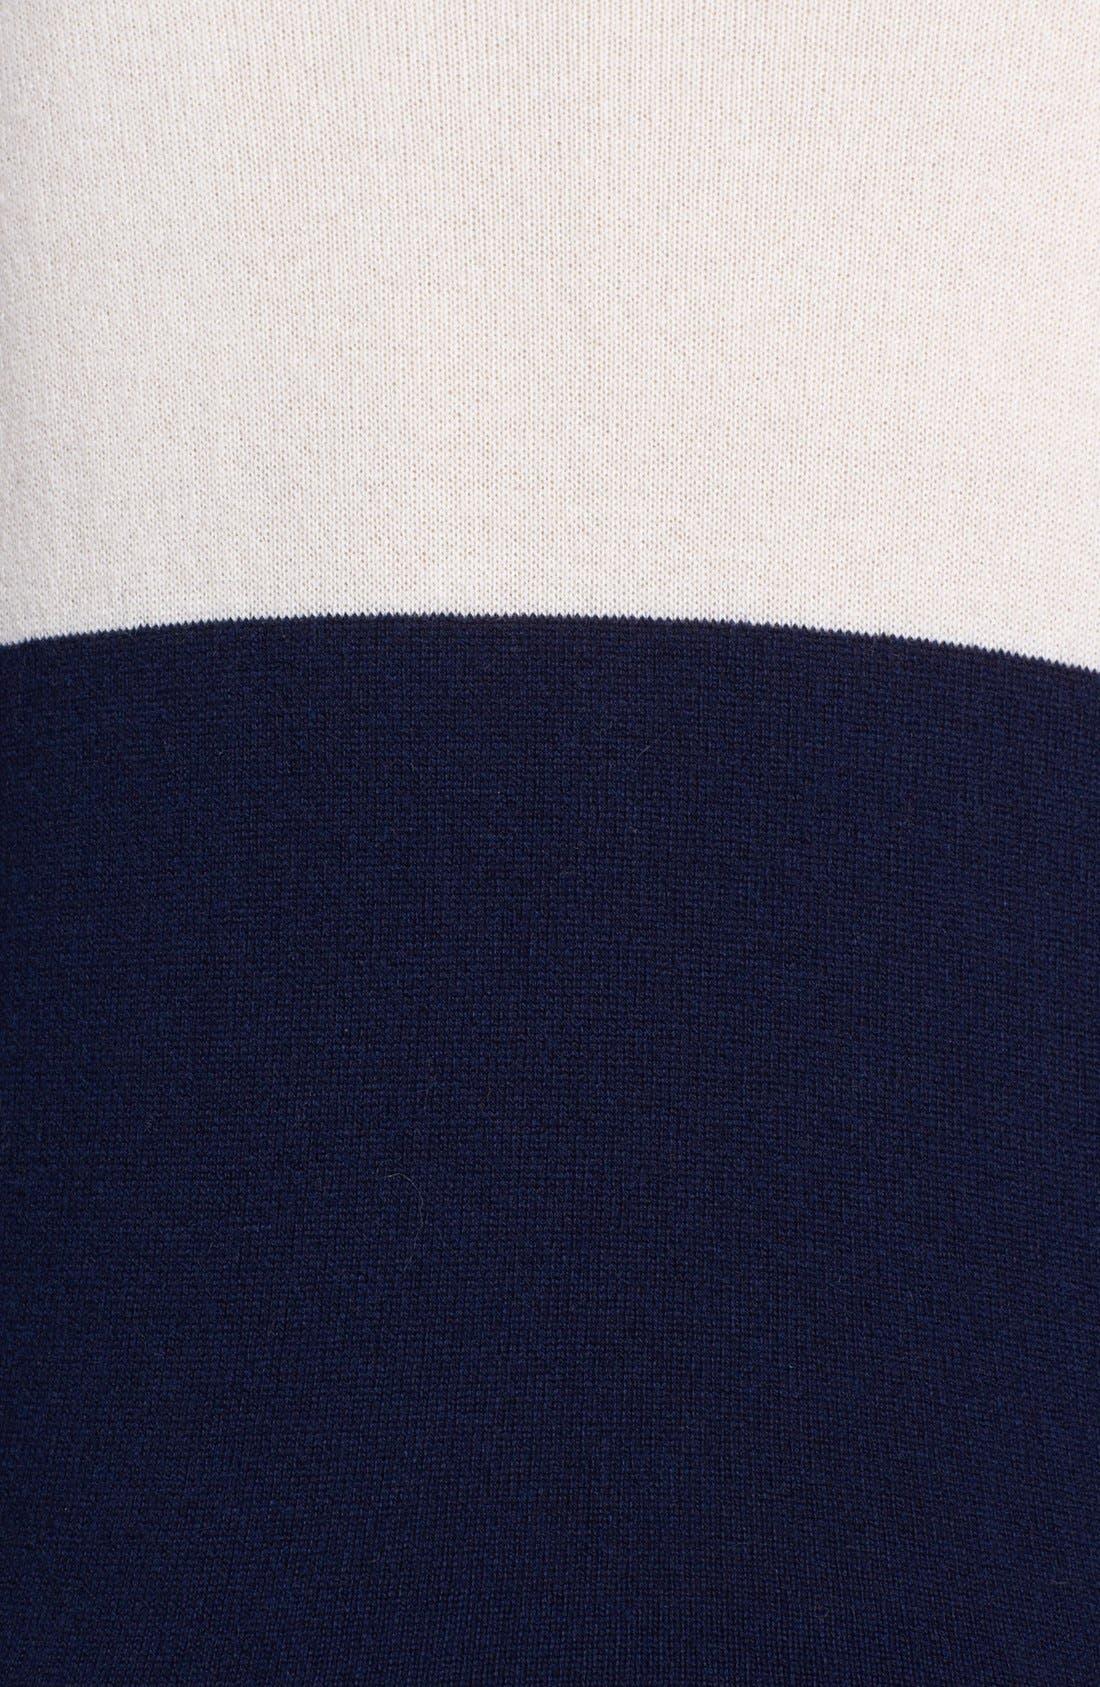 Alternate Image 3  - Splendid Colorblock Sweater